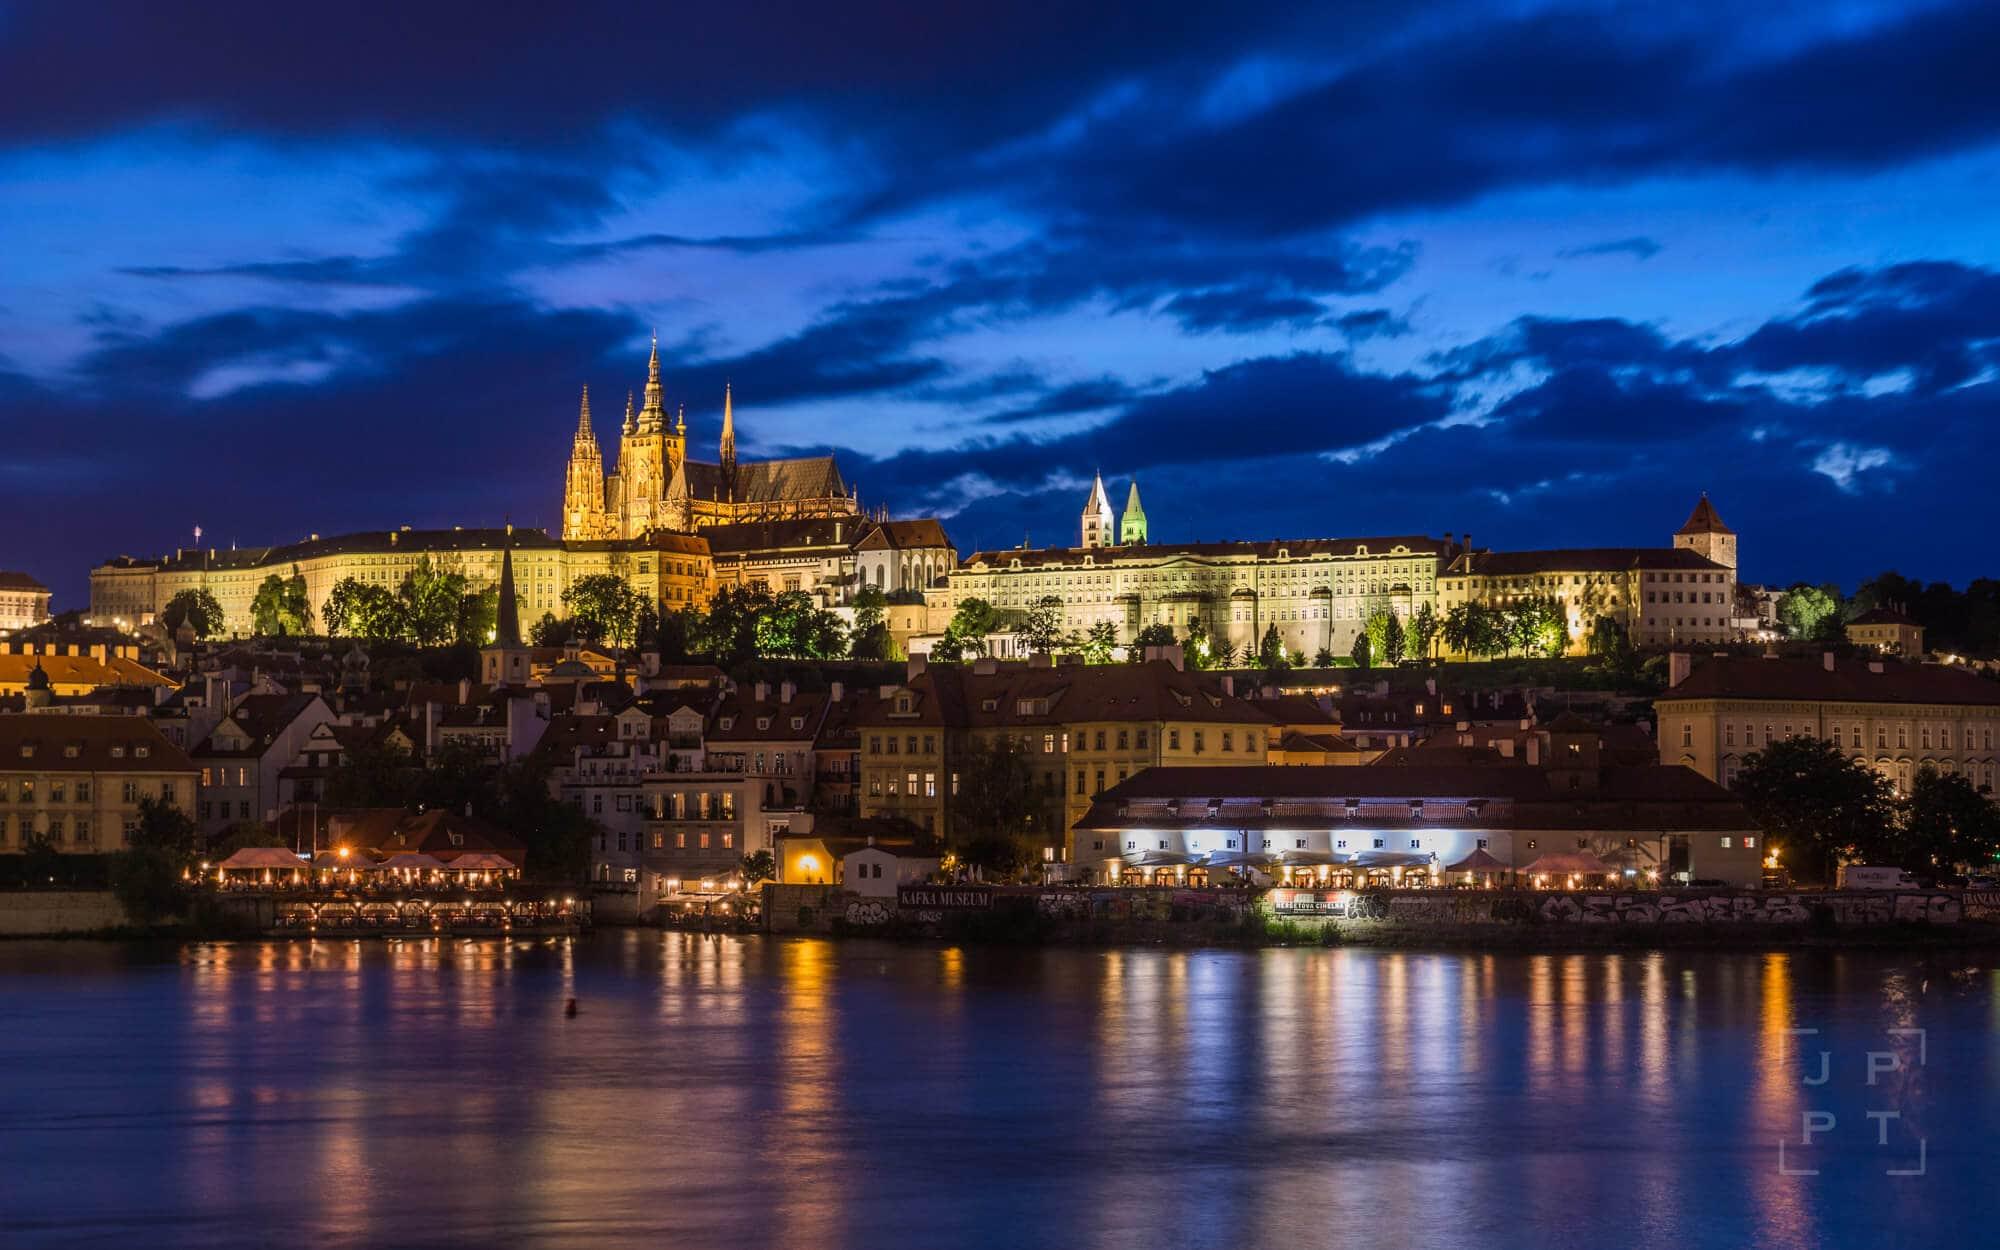 Illuminated Prague Castle